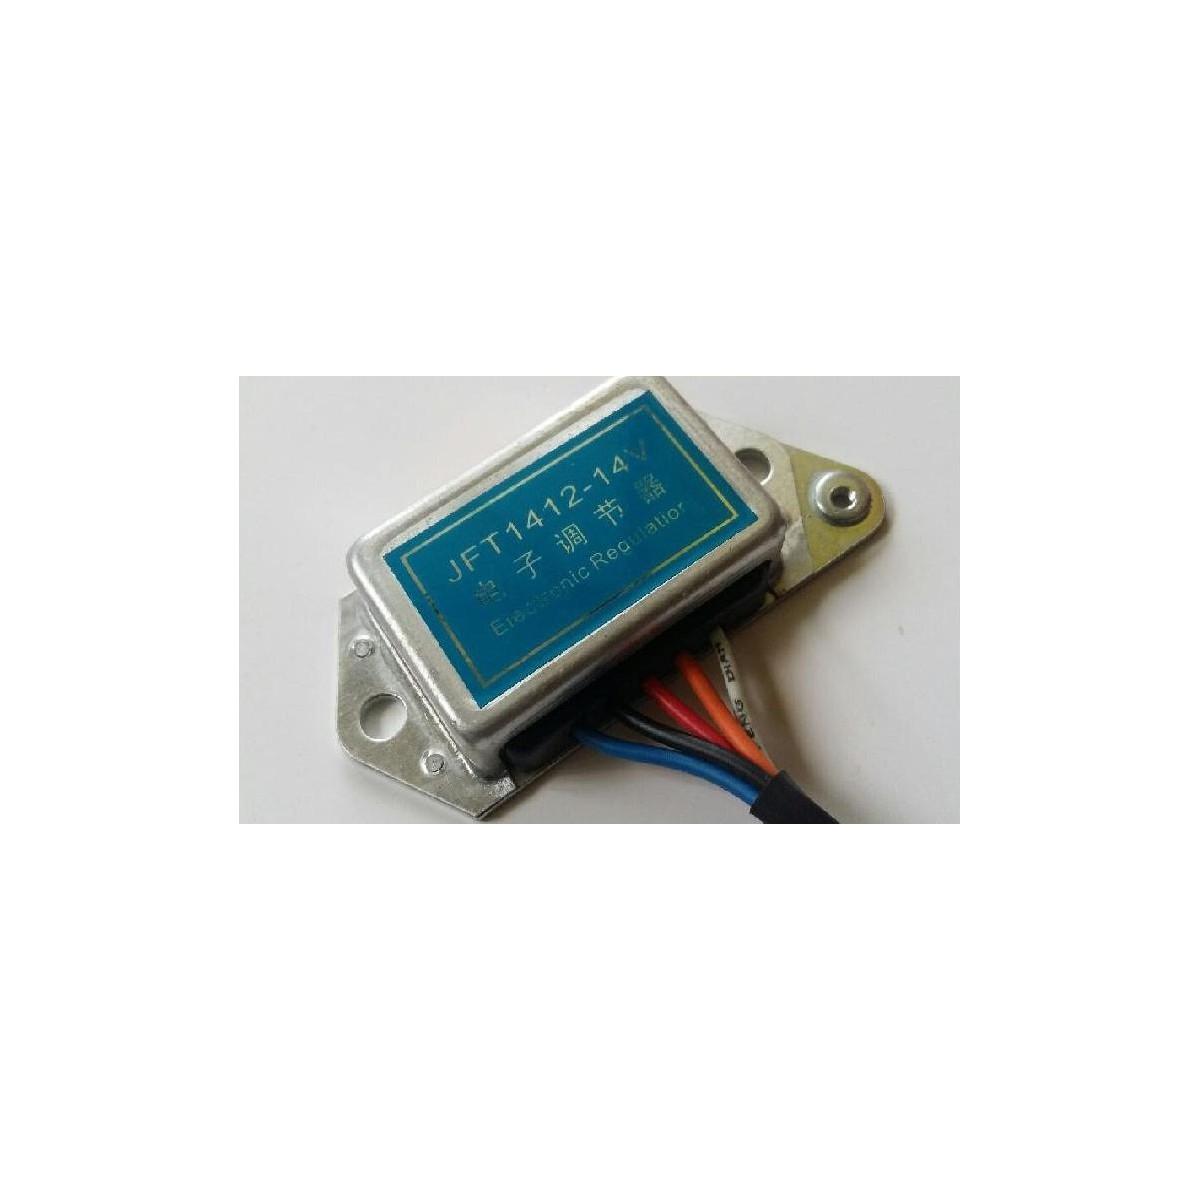 Voltage regulator JFT1412 Jinma JM204